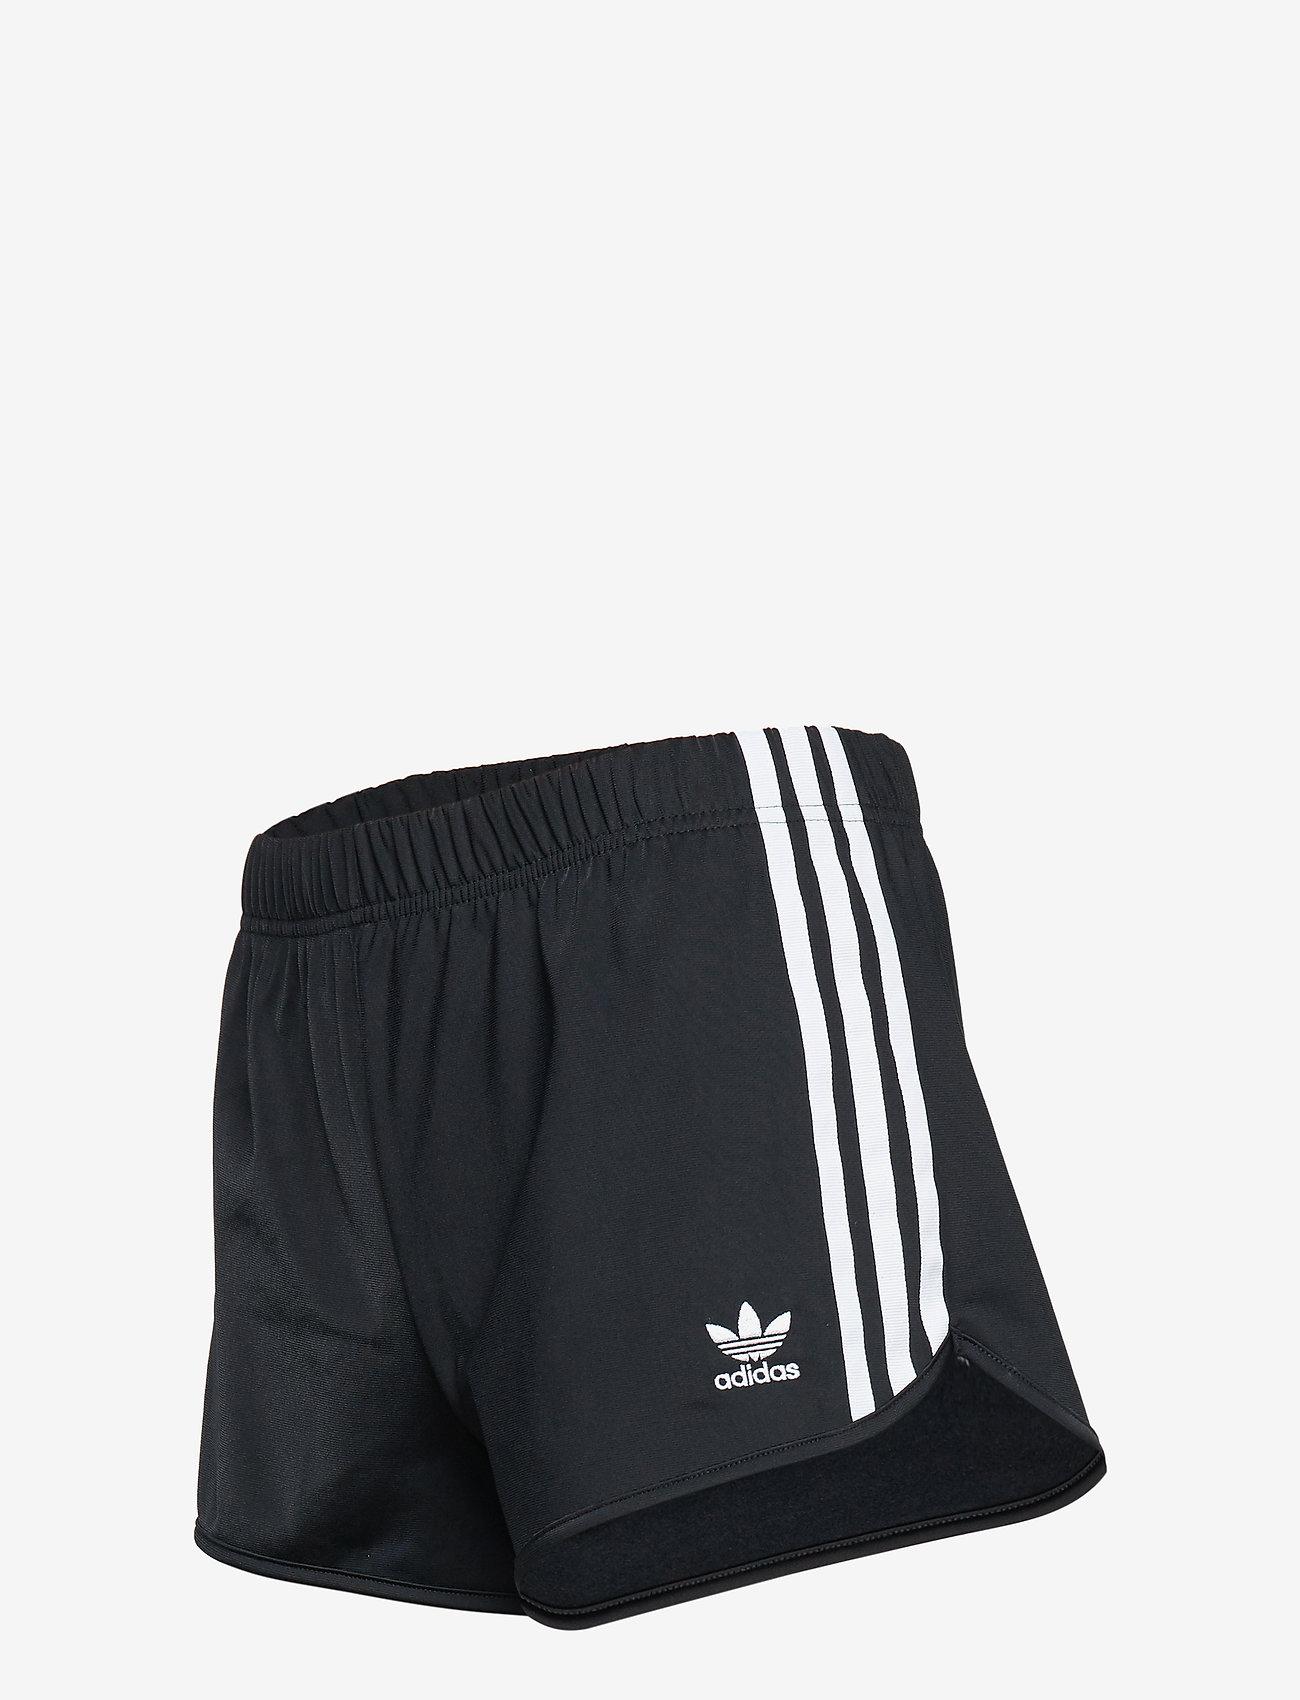 3 Str Short (Black) (19.96 €) - adidas Originals XZuoO